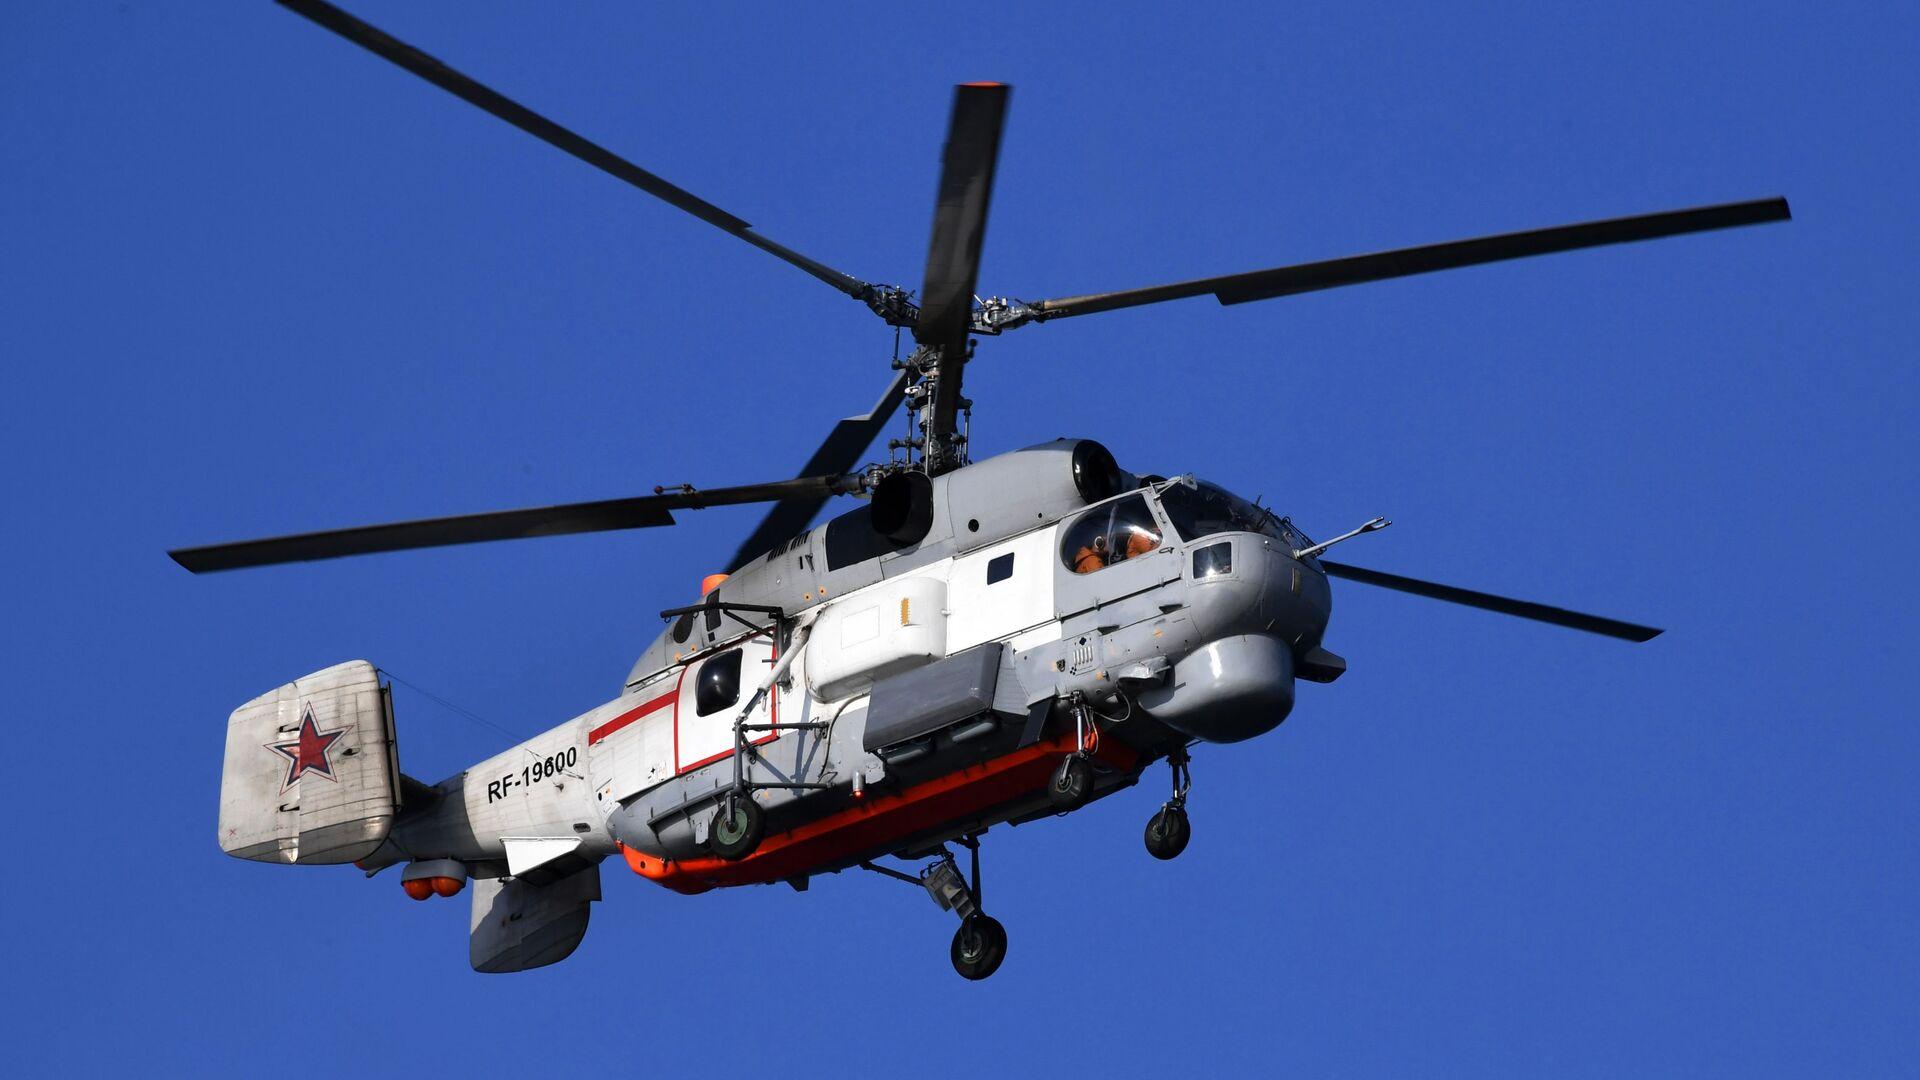 Helicóptero ruso Ka-27 - Sputnik Mundo, 1920, 23.09.2021